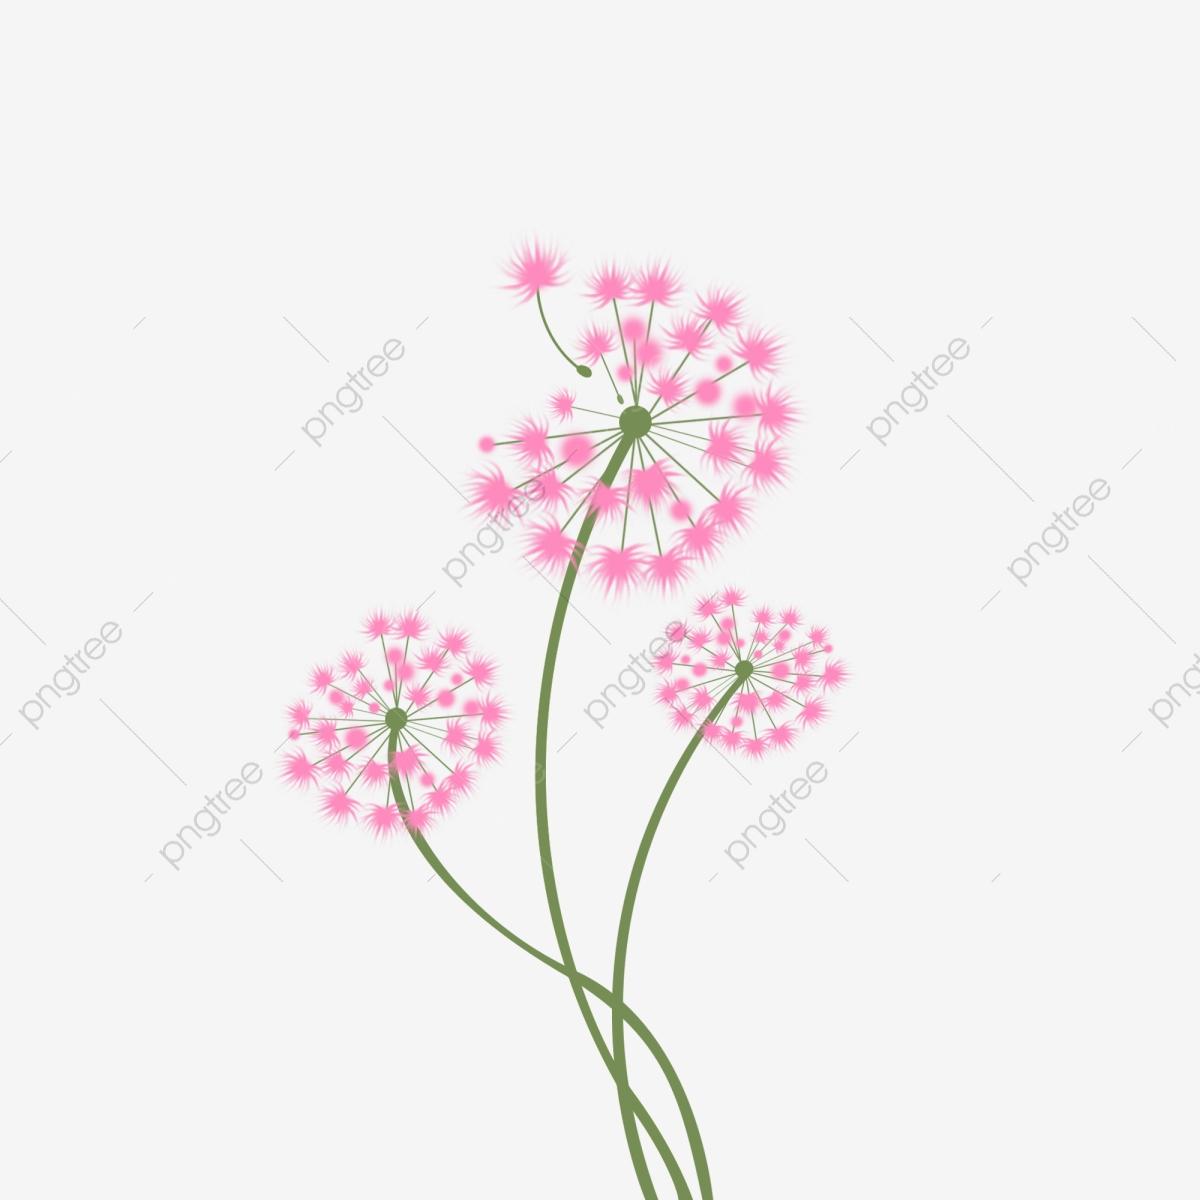 Hand painted flower plant. Dandelion clipart pink dandelion